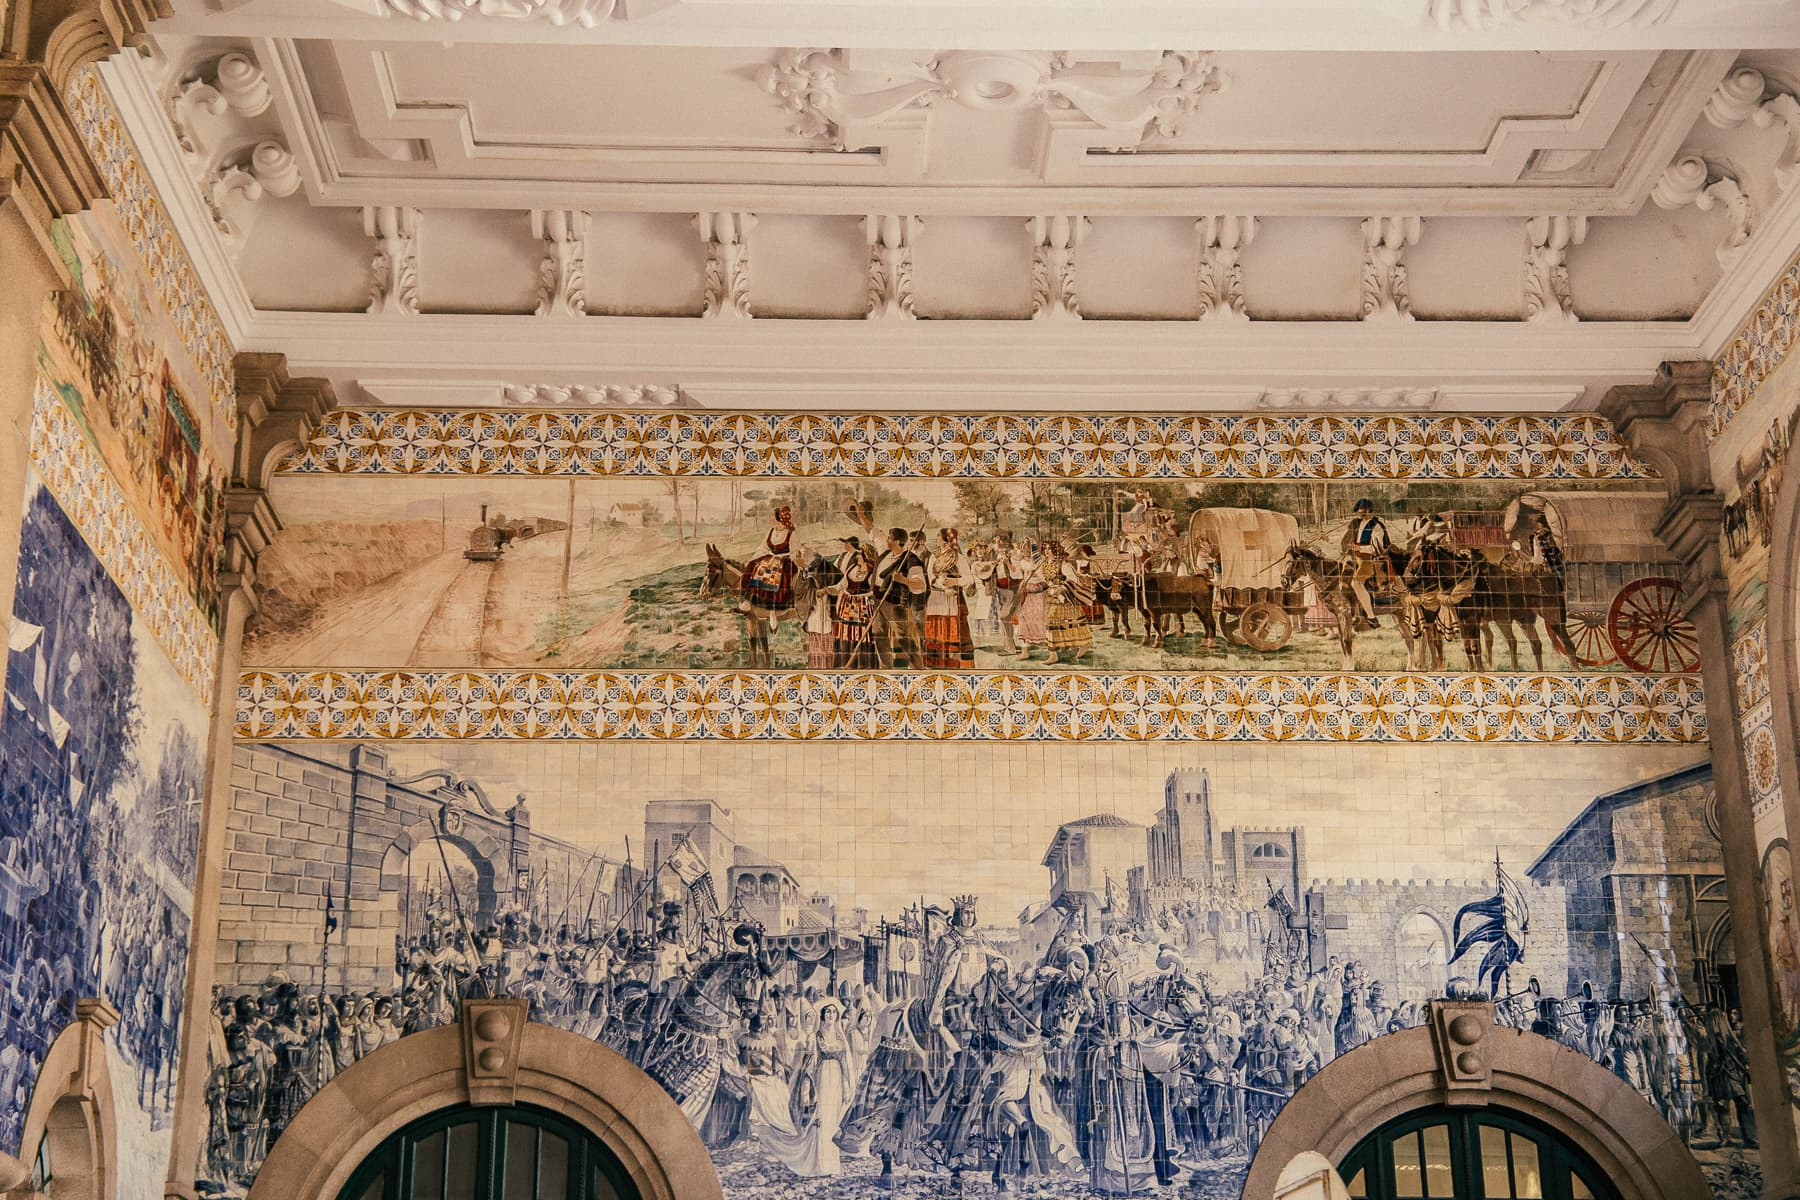 zehn-porto-tipps-fuer-deine-staedtereise-in-portugal-reiseblog-des-belles-choses 10